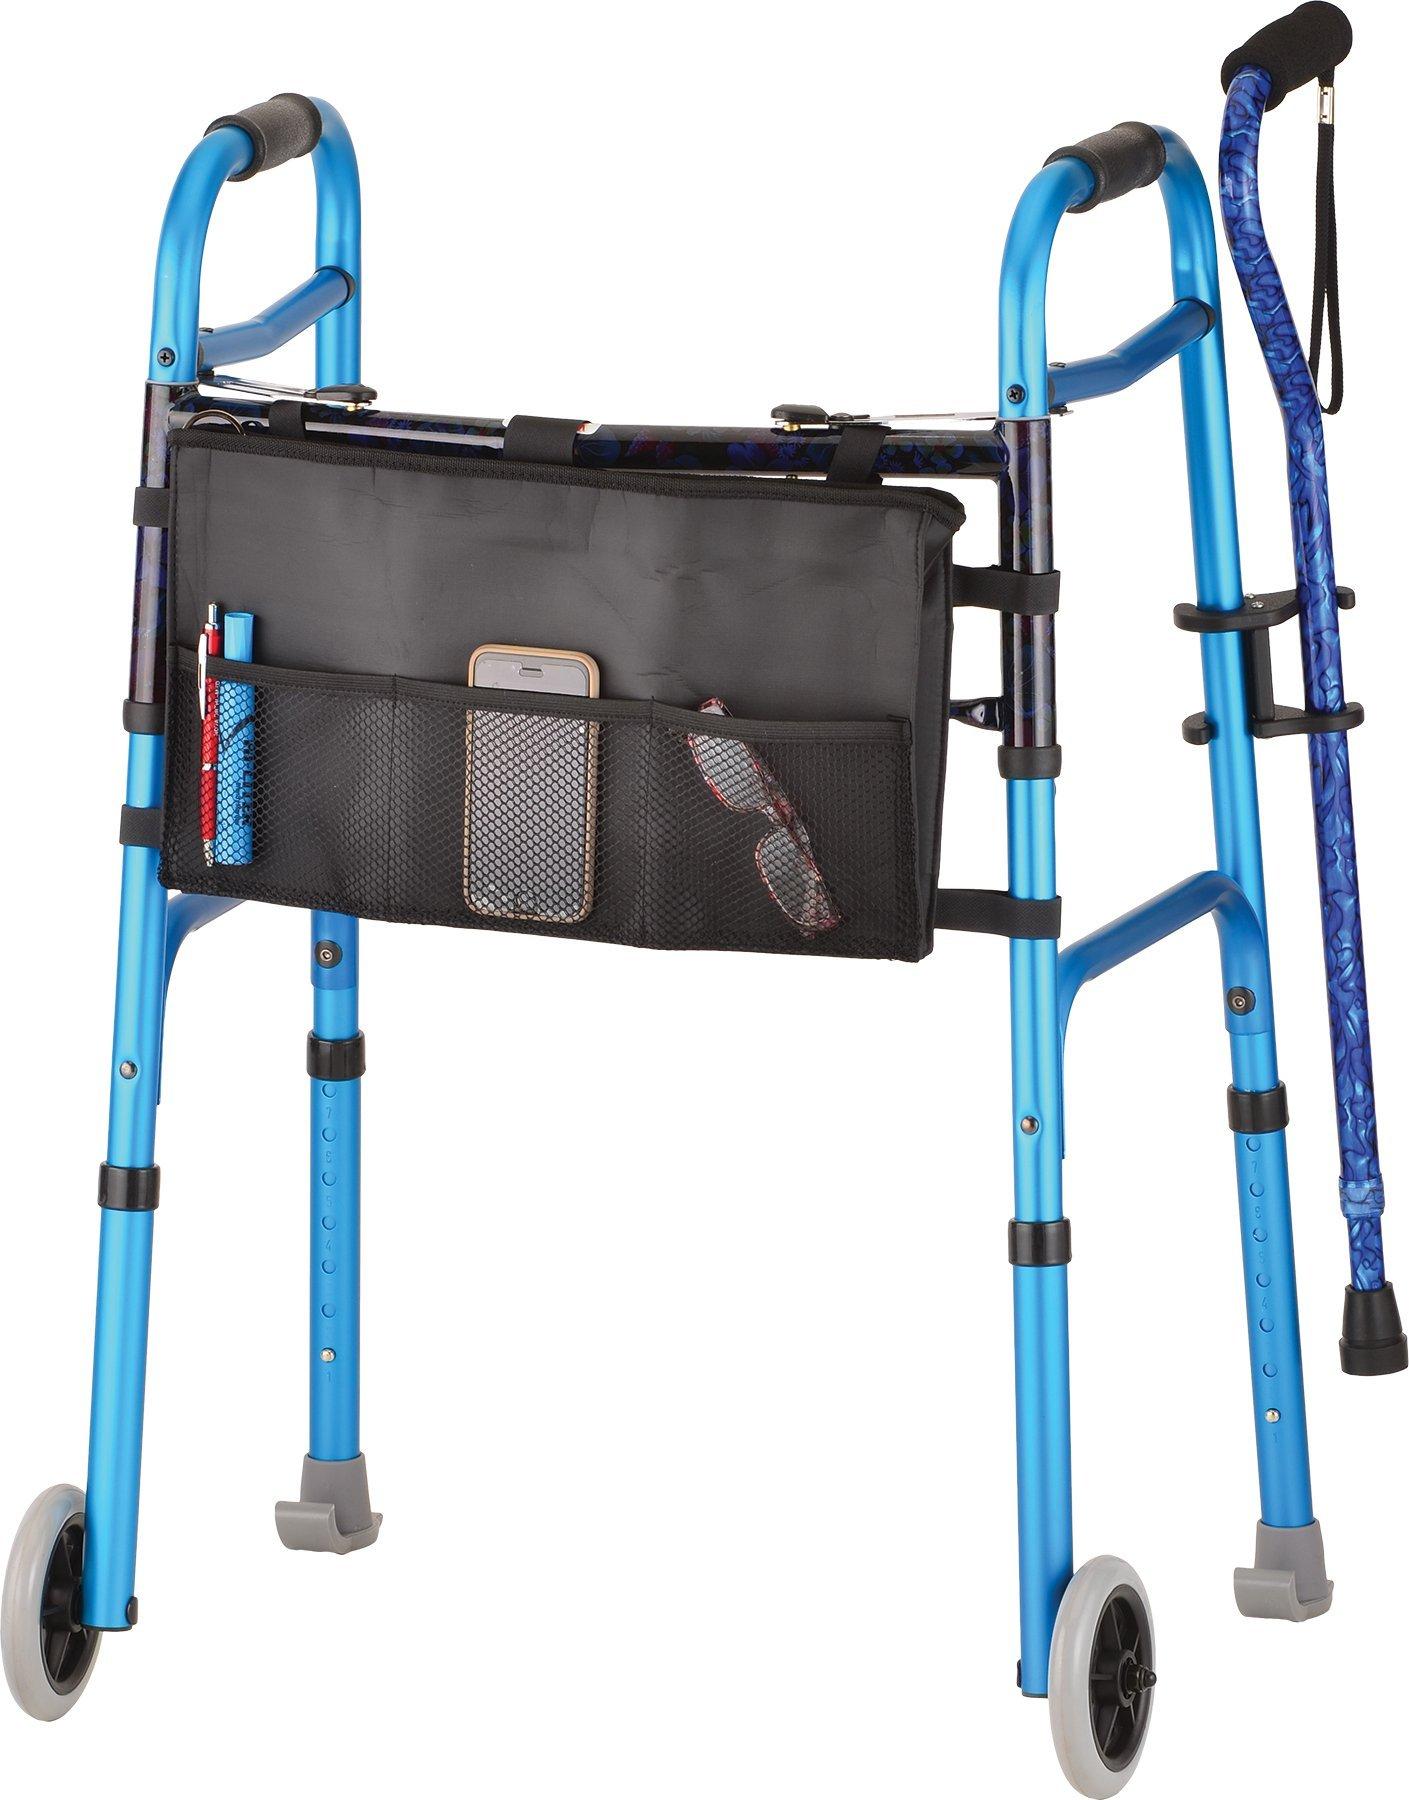 NOVA Designer Folding Walker with Cane and Accessories, Blue